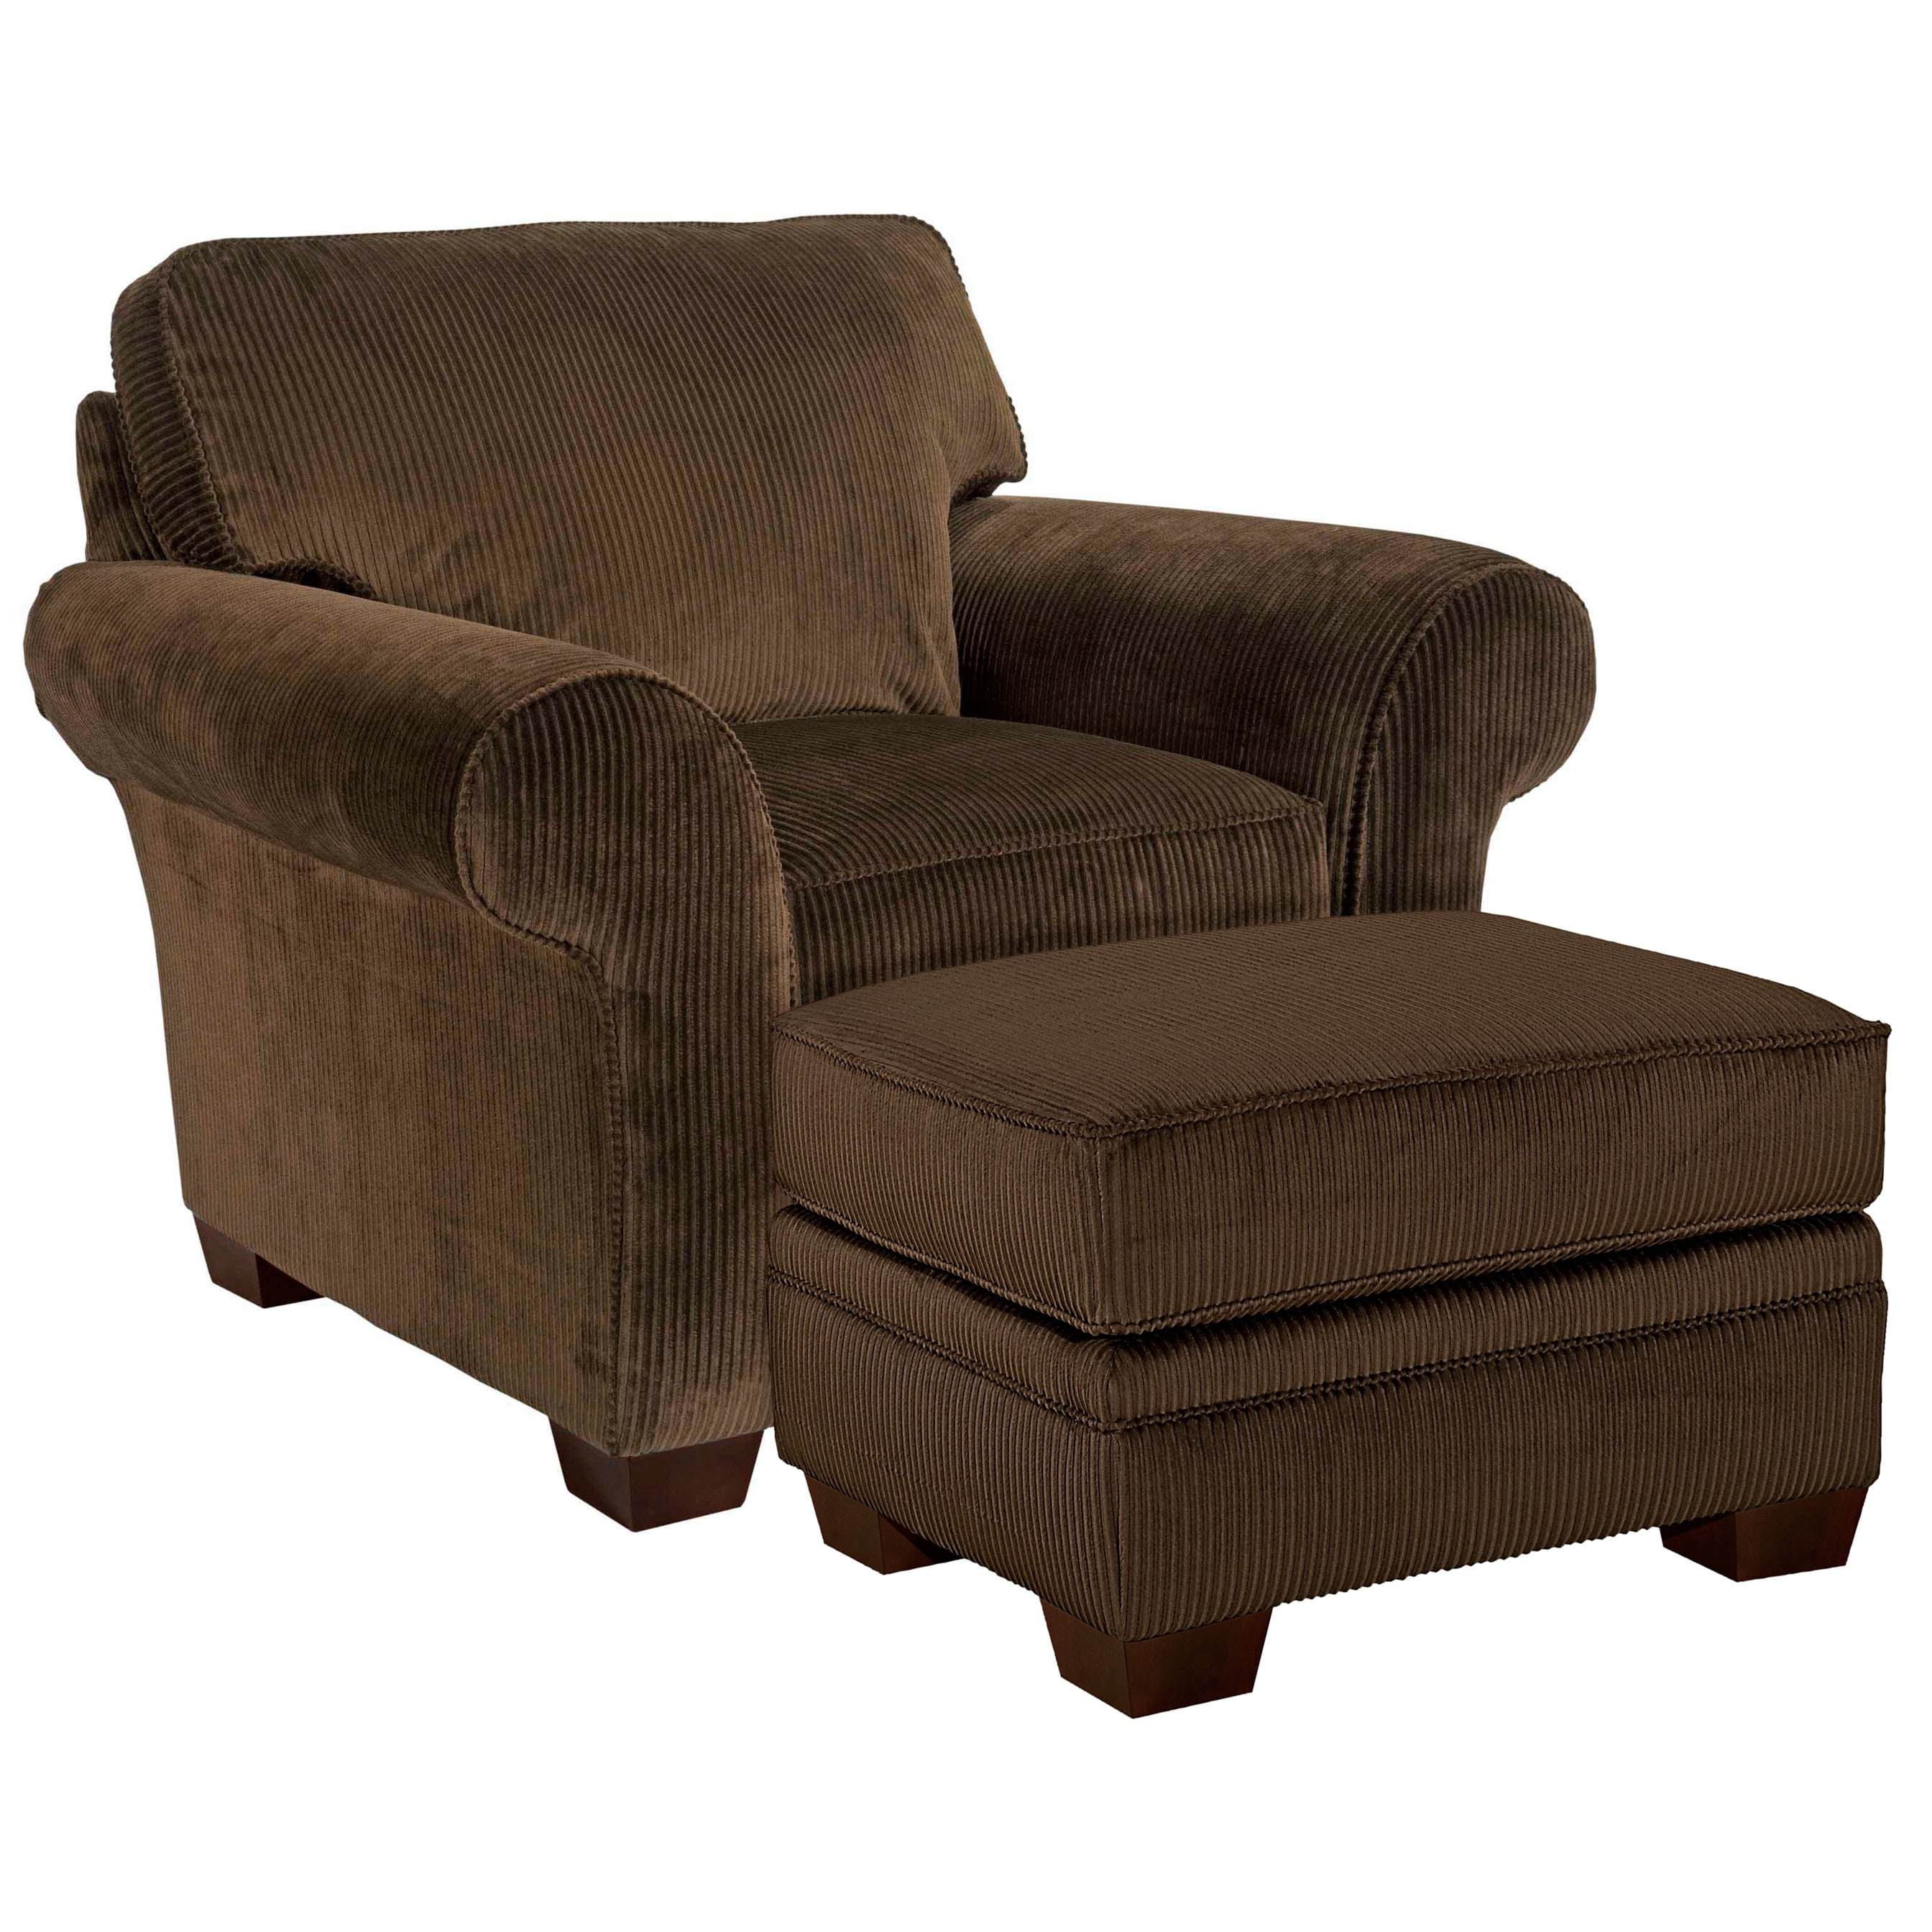 Broyhill Furniture Store